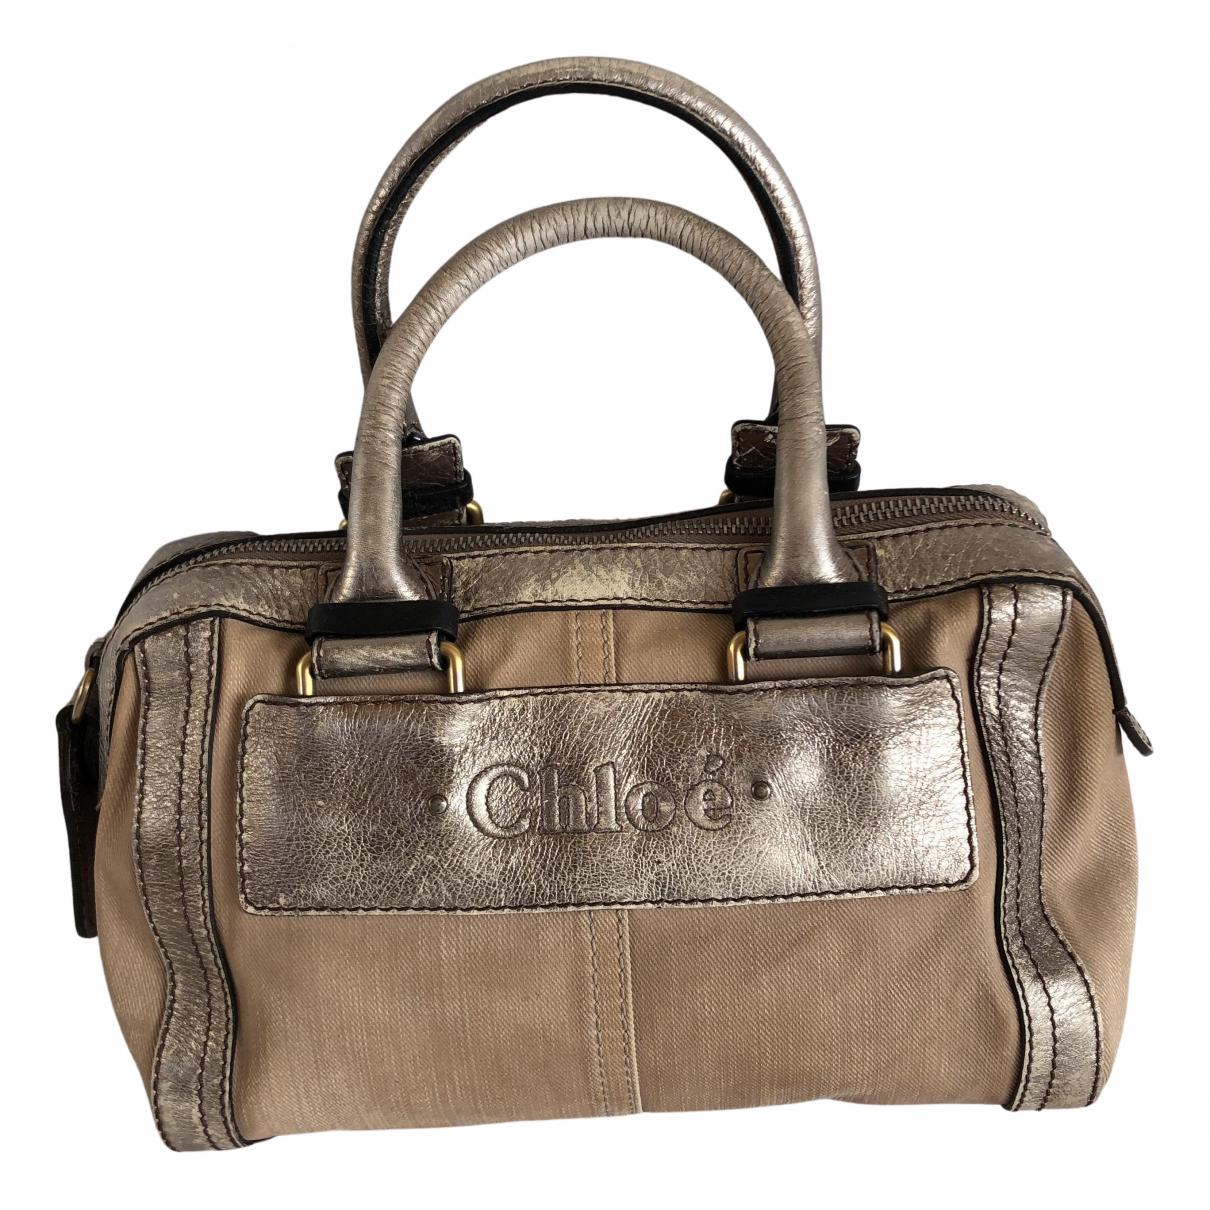 Chloé \N Brown handbag for Women \N